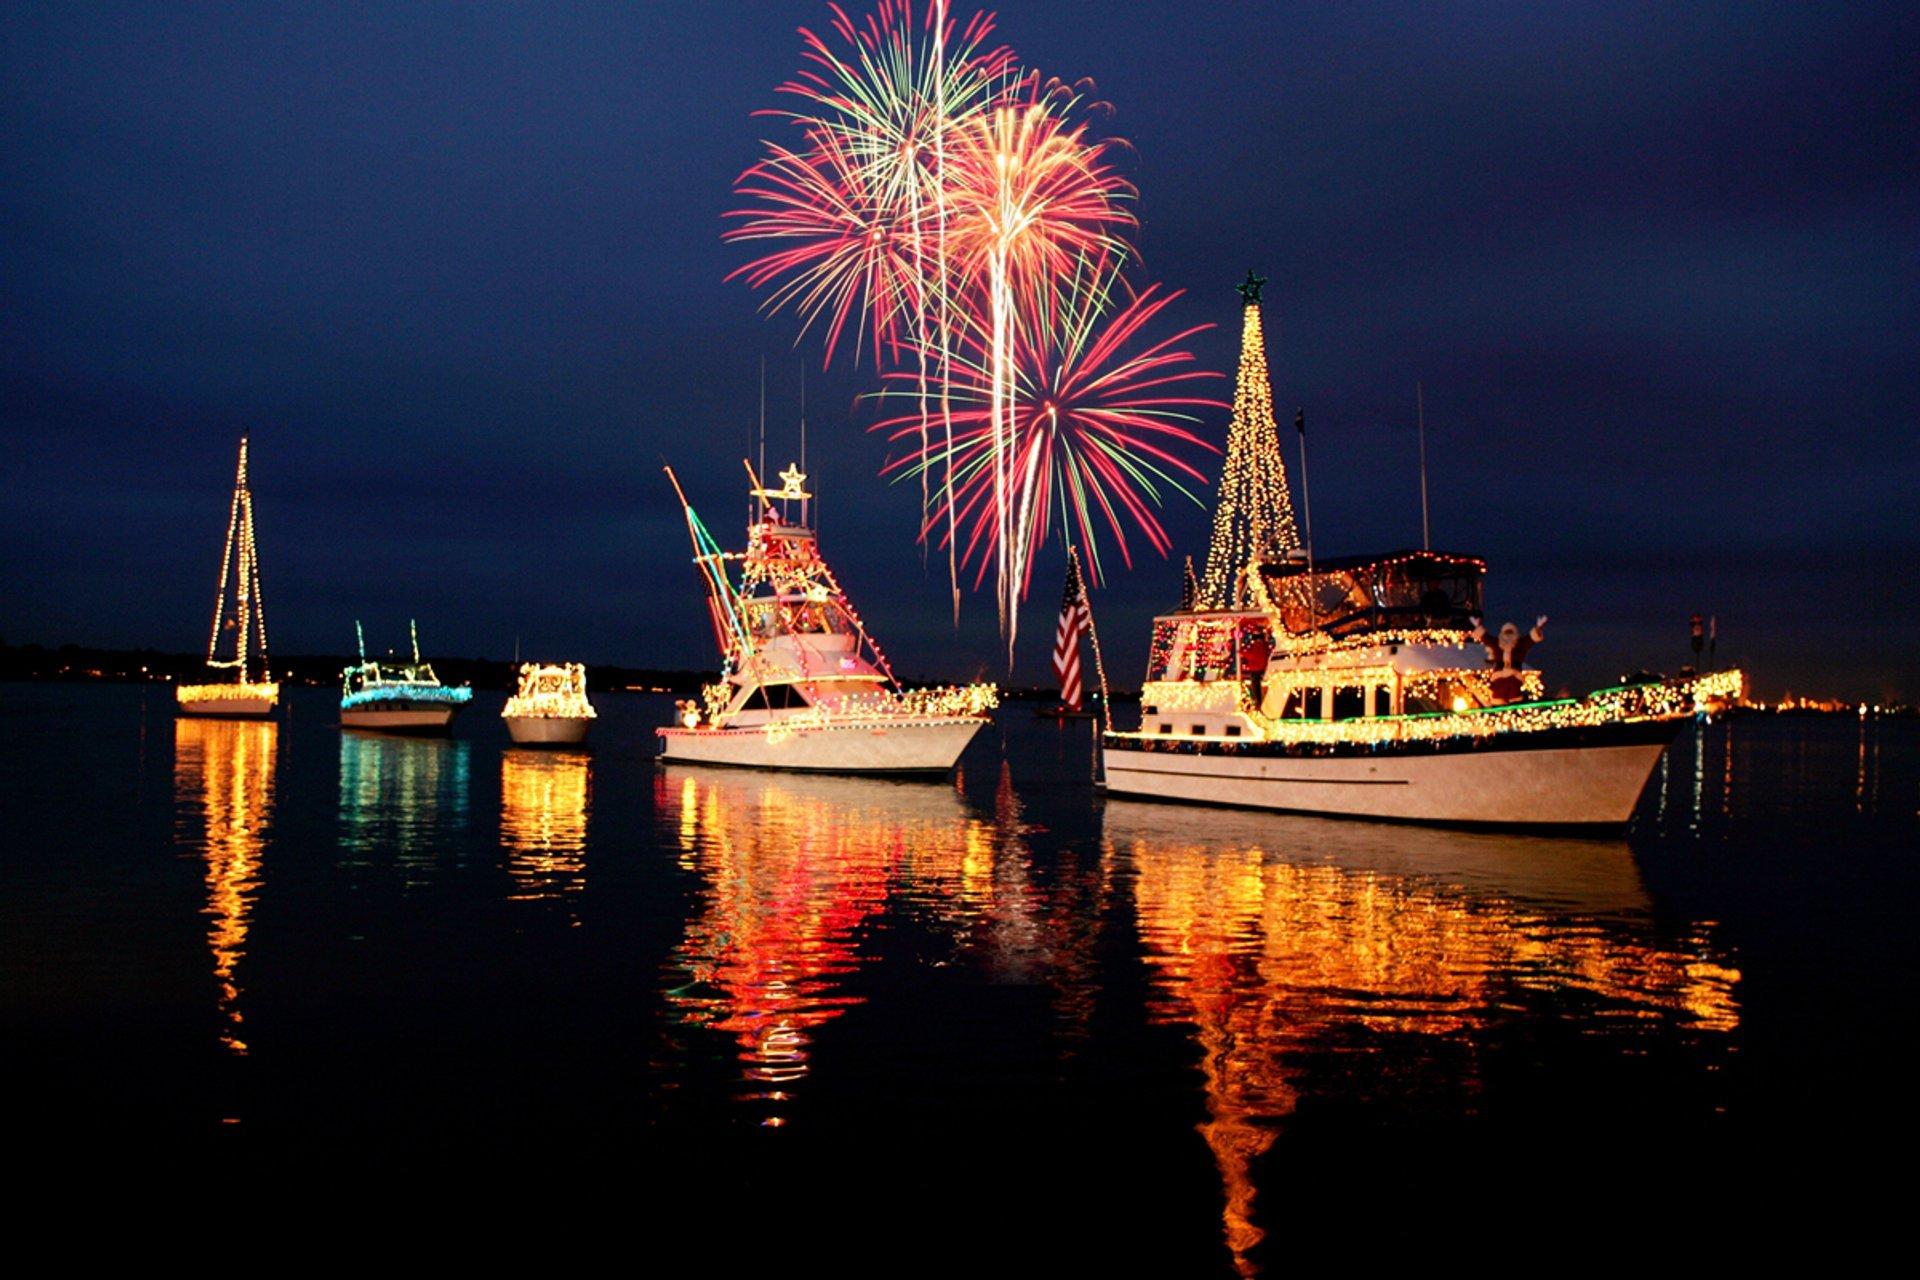 Christmas Lights In Louisiana 2021 Christmas Lights 2021 2022 In Louisiana Dates